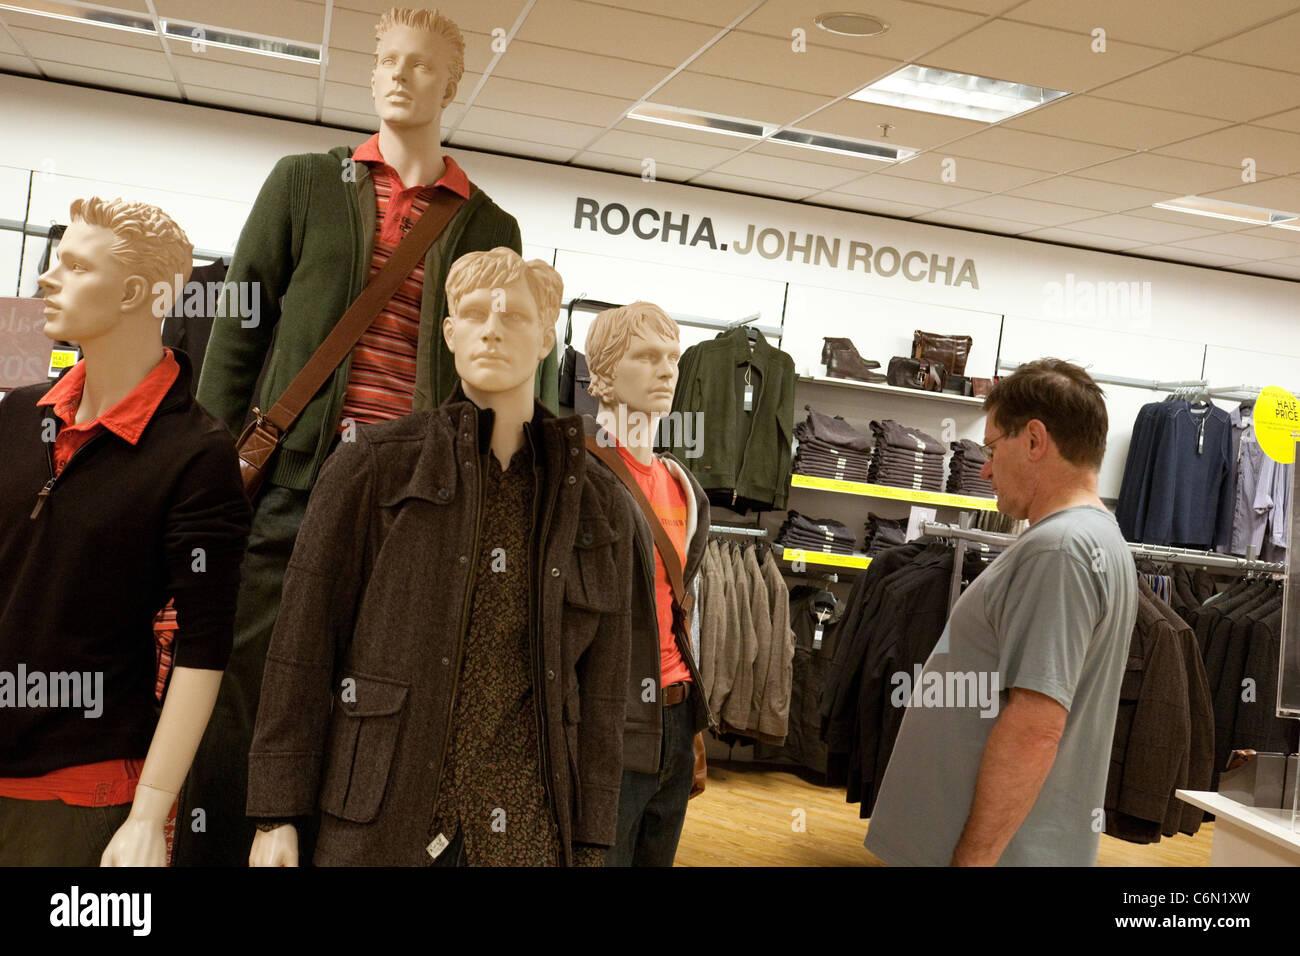 A man shopping for clothes, John Rocha store, UK - Stock Image